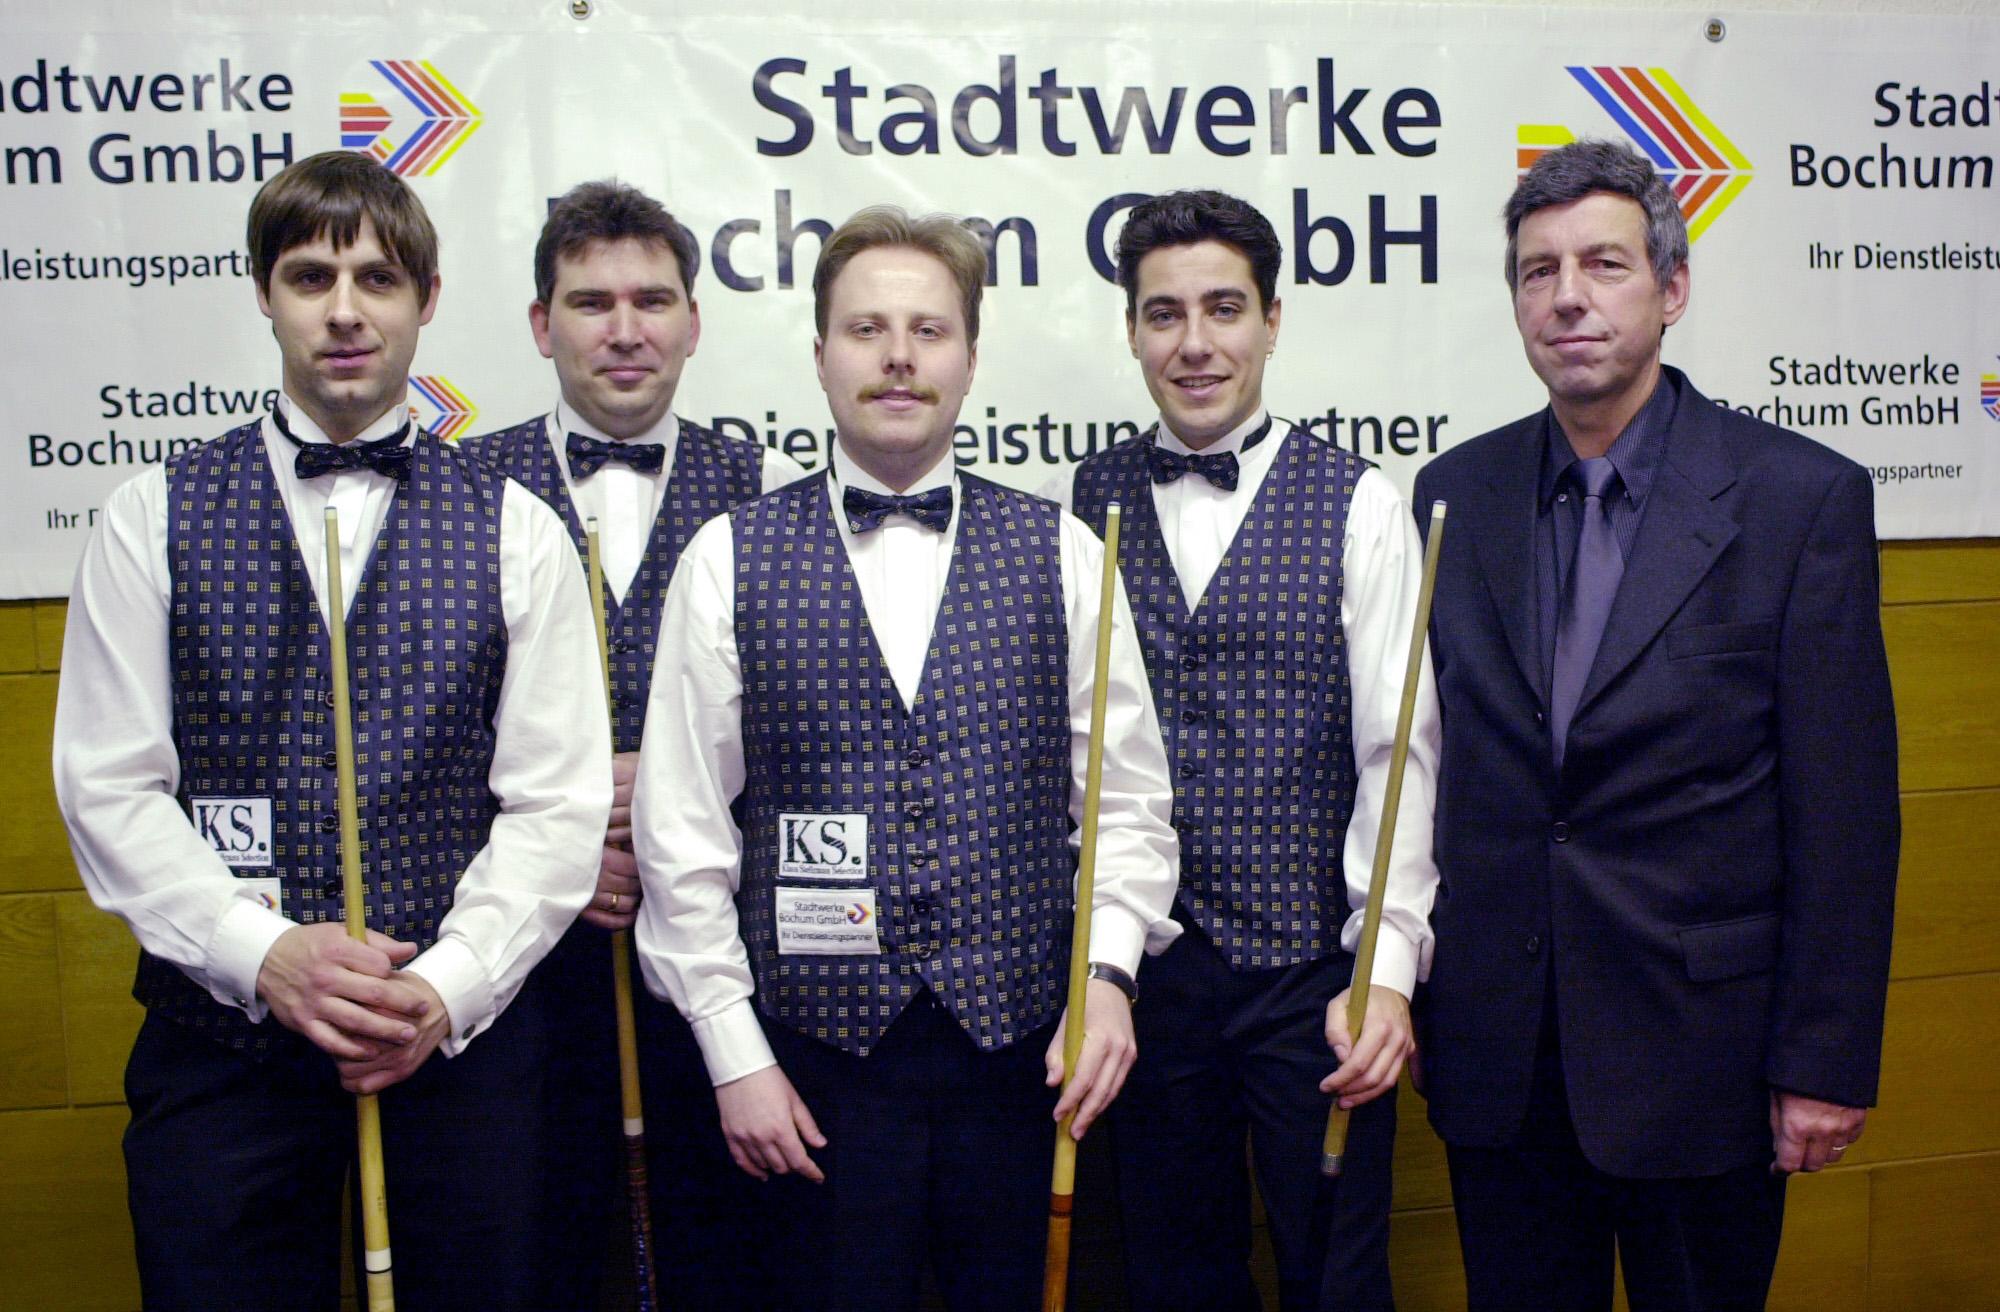 Tillemann, Blondeel, Nockemann, Pessarra und Teamchef Paul Kimmeskamp